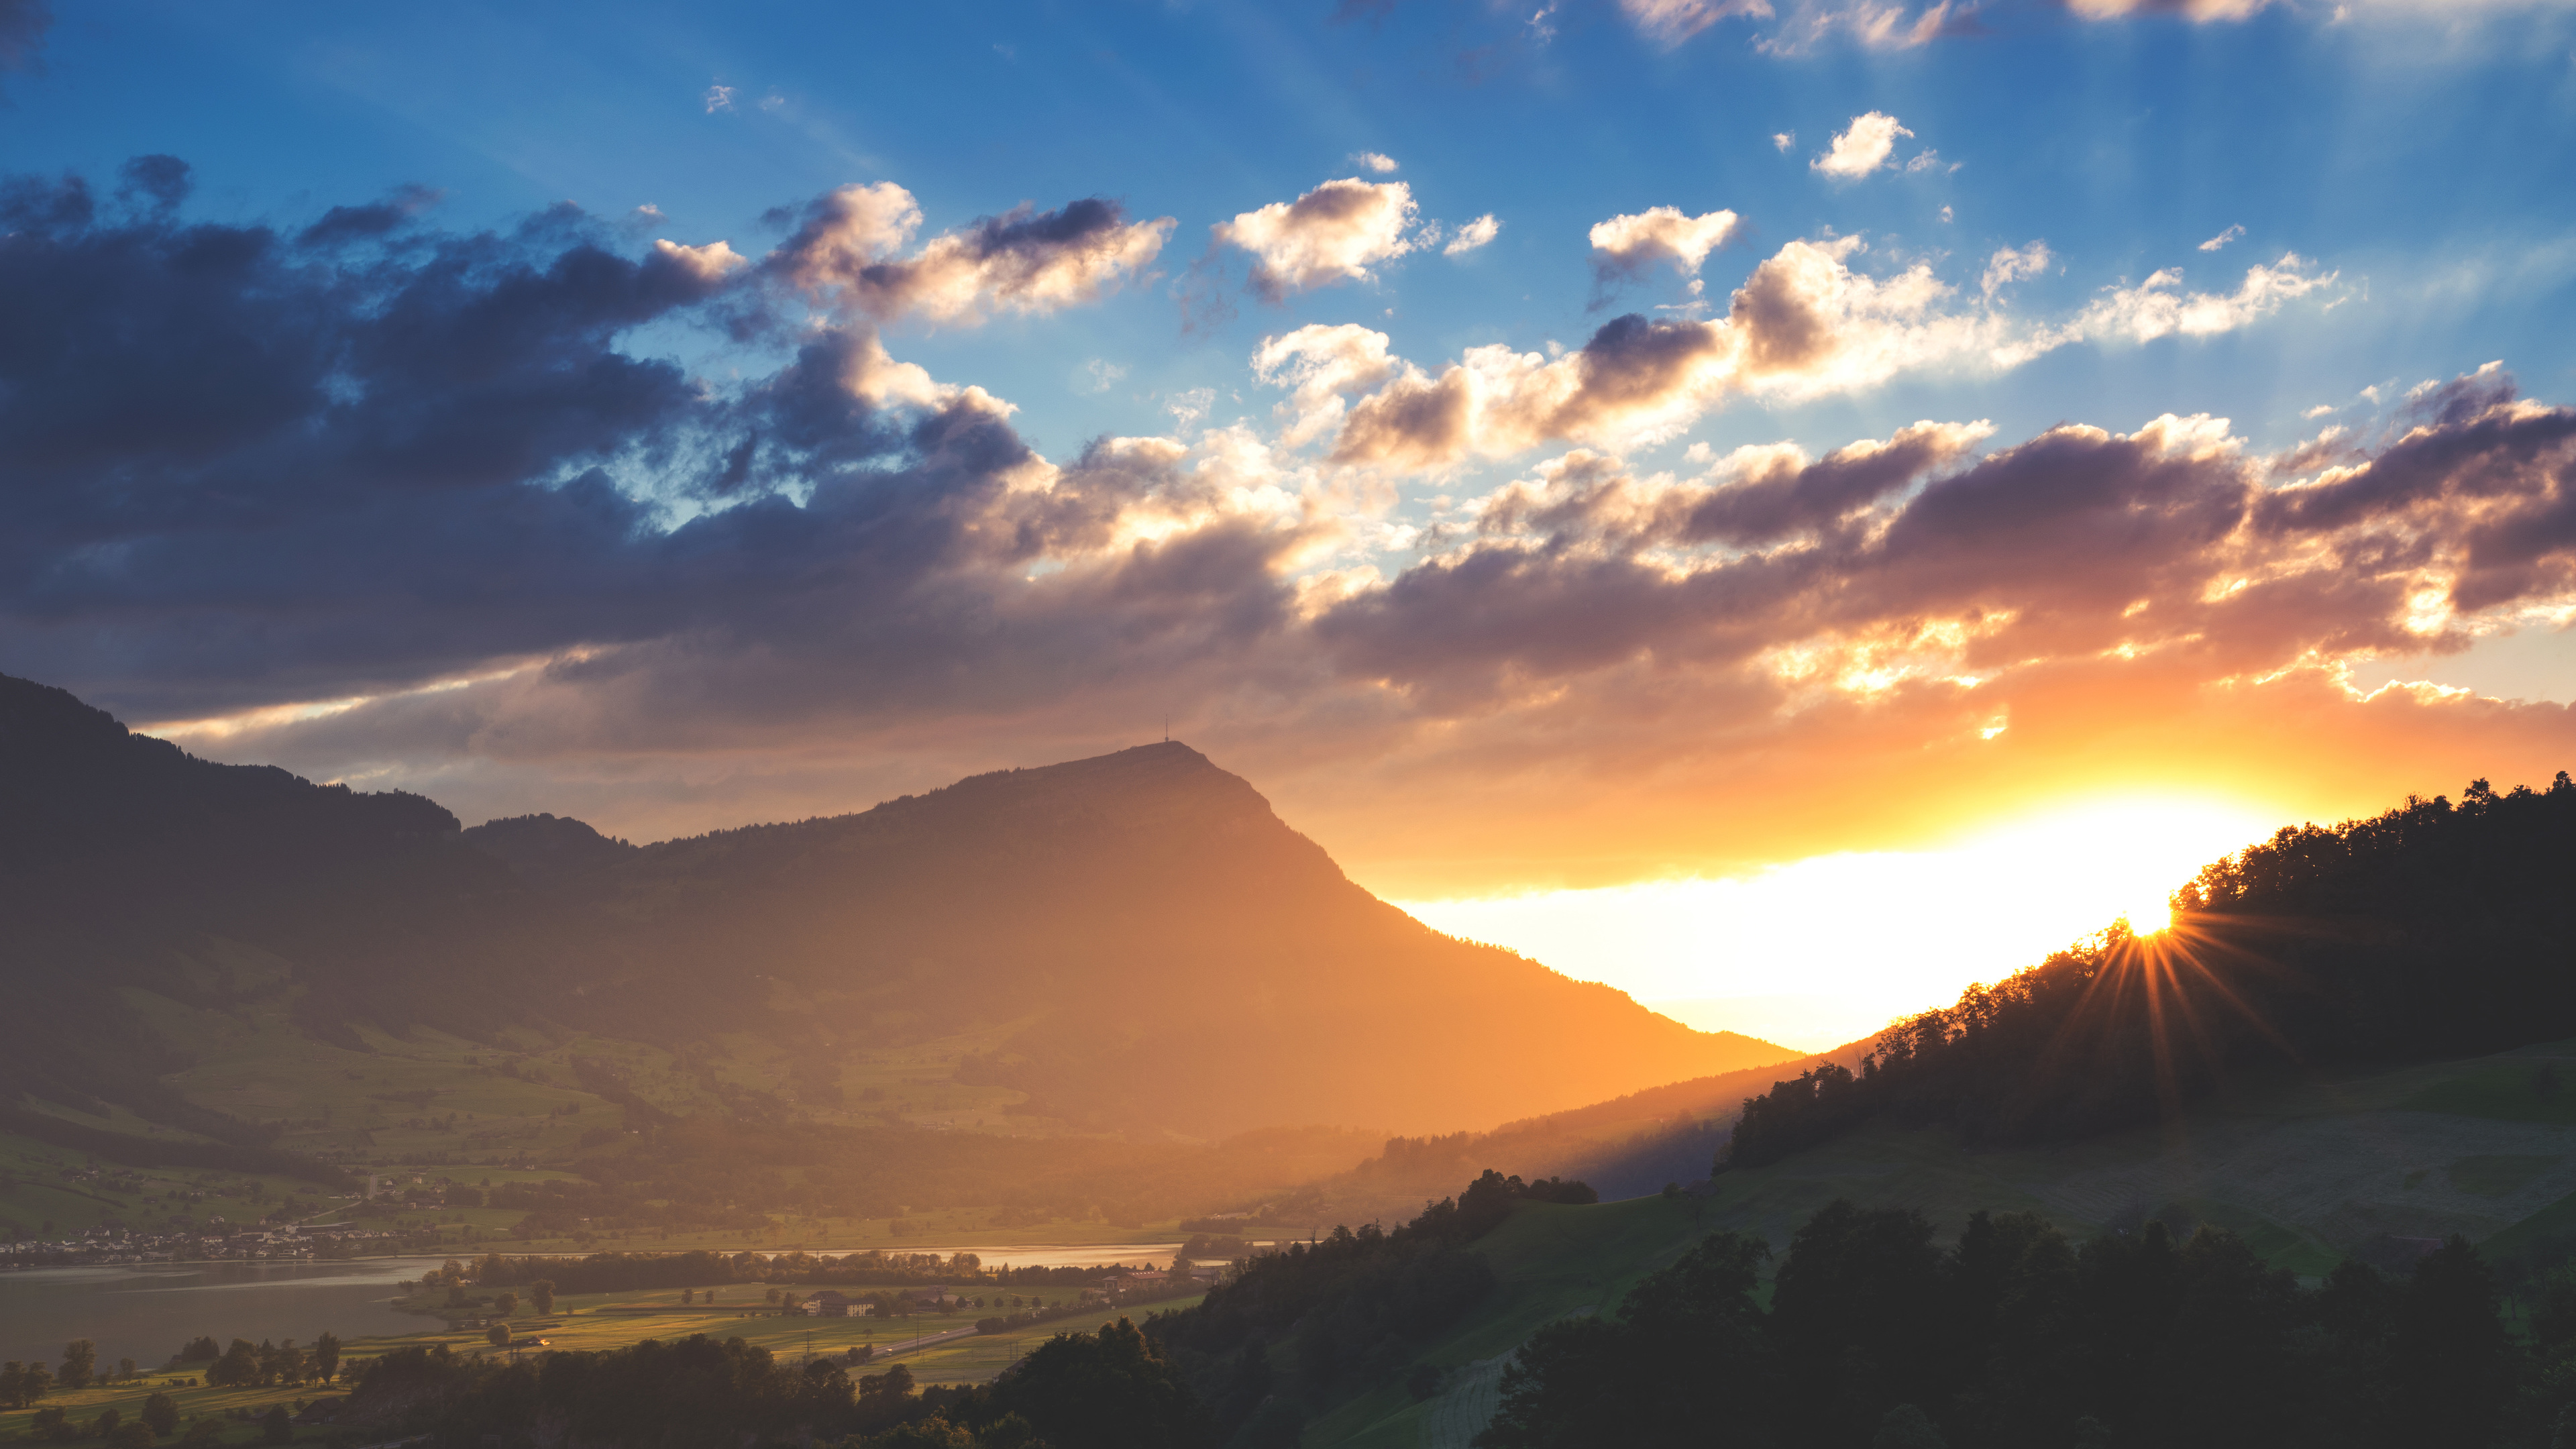 sunbeams mountains landscape 4k 1540136330 - Sunbeams Mountains Landscape 4k - sunbeam wallpapers, nature wallpapers, mountains wallpapers, landscape wallpapers, hd-wallpapers, 5k wallpapers, 4k-wallpapers